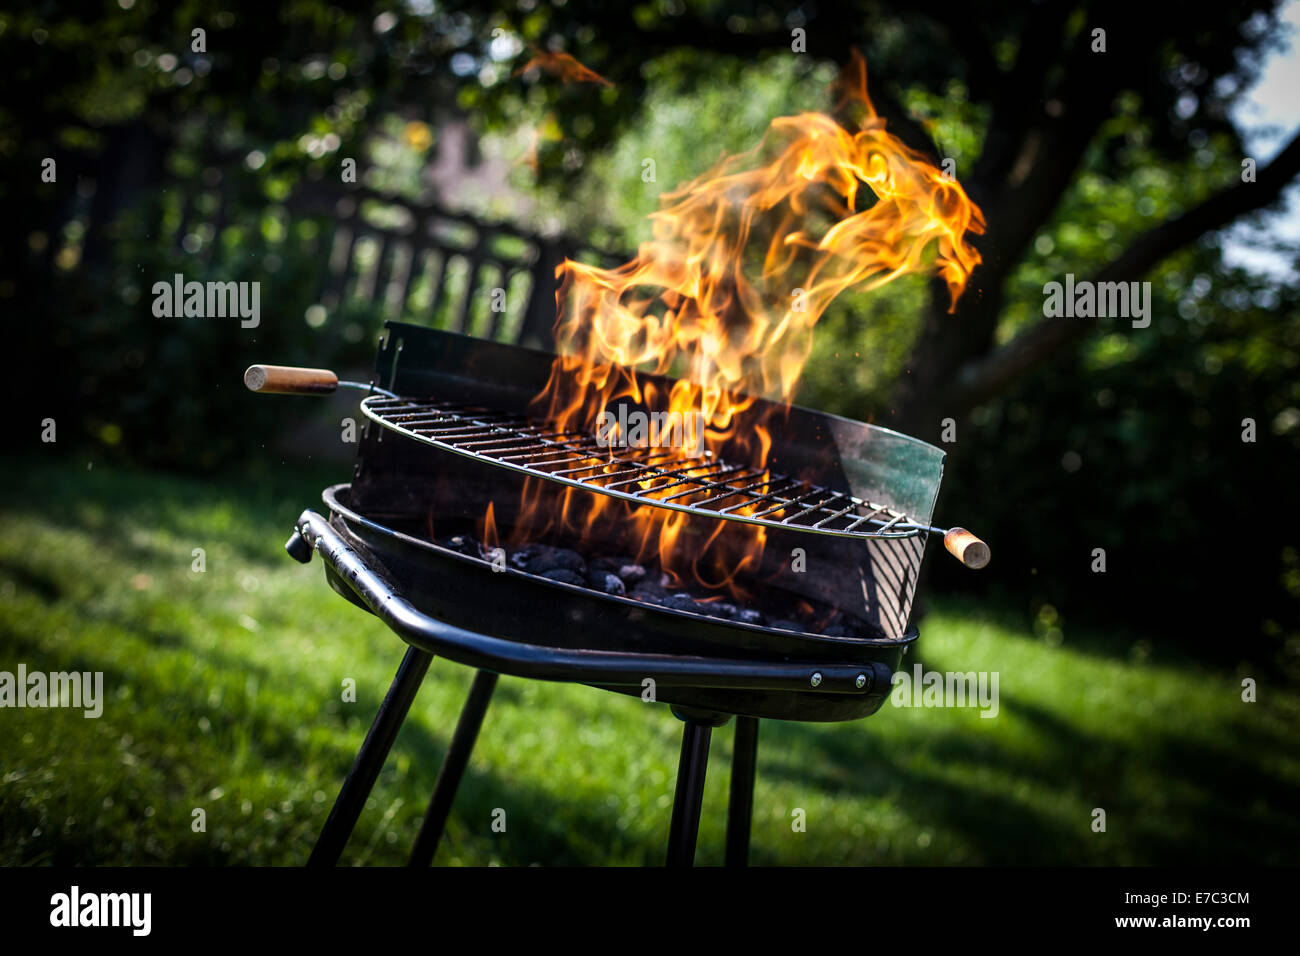 Super Flammen auf dem grill Stockbild